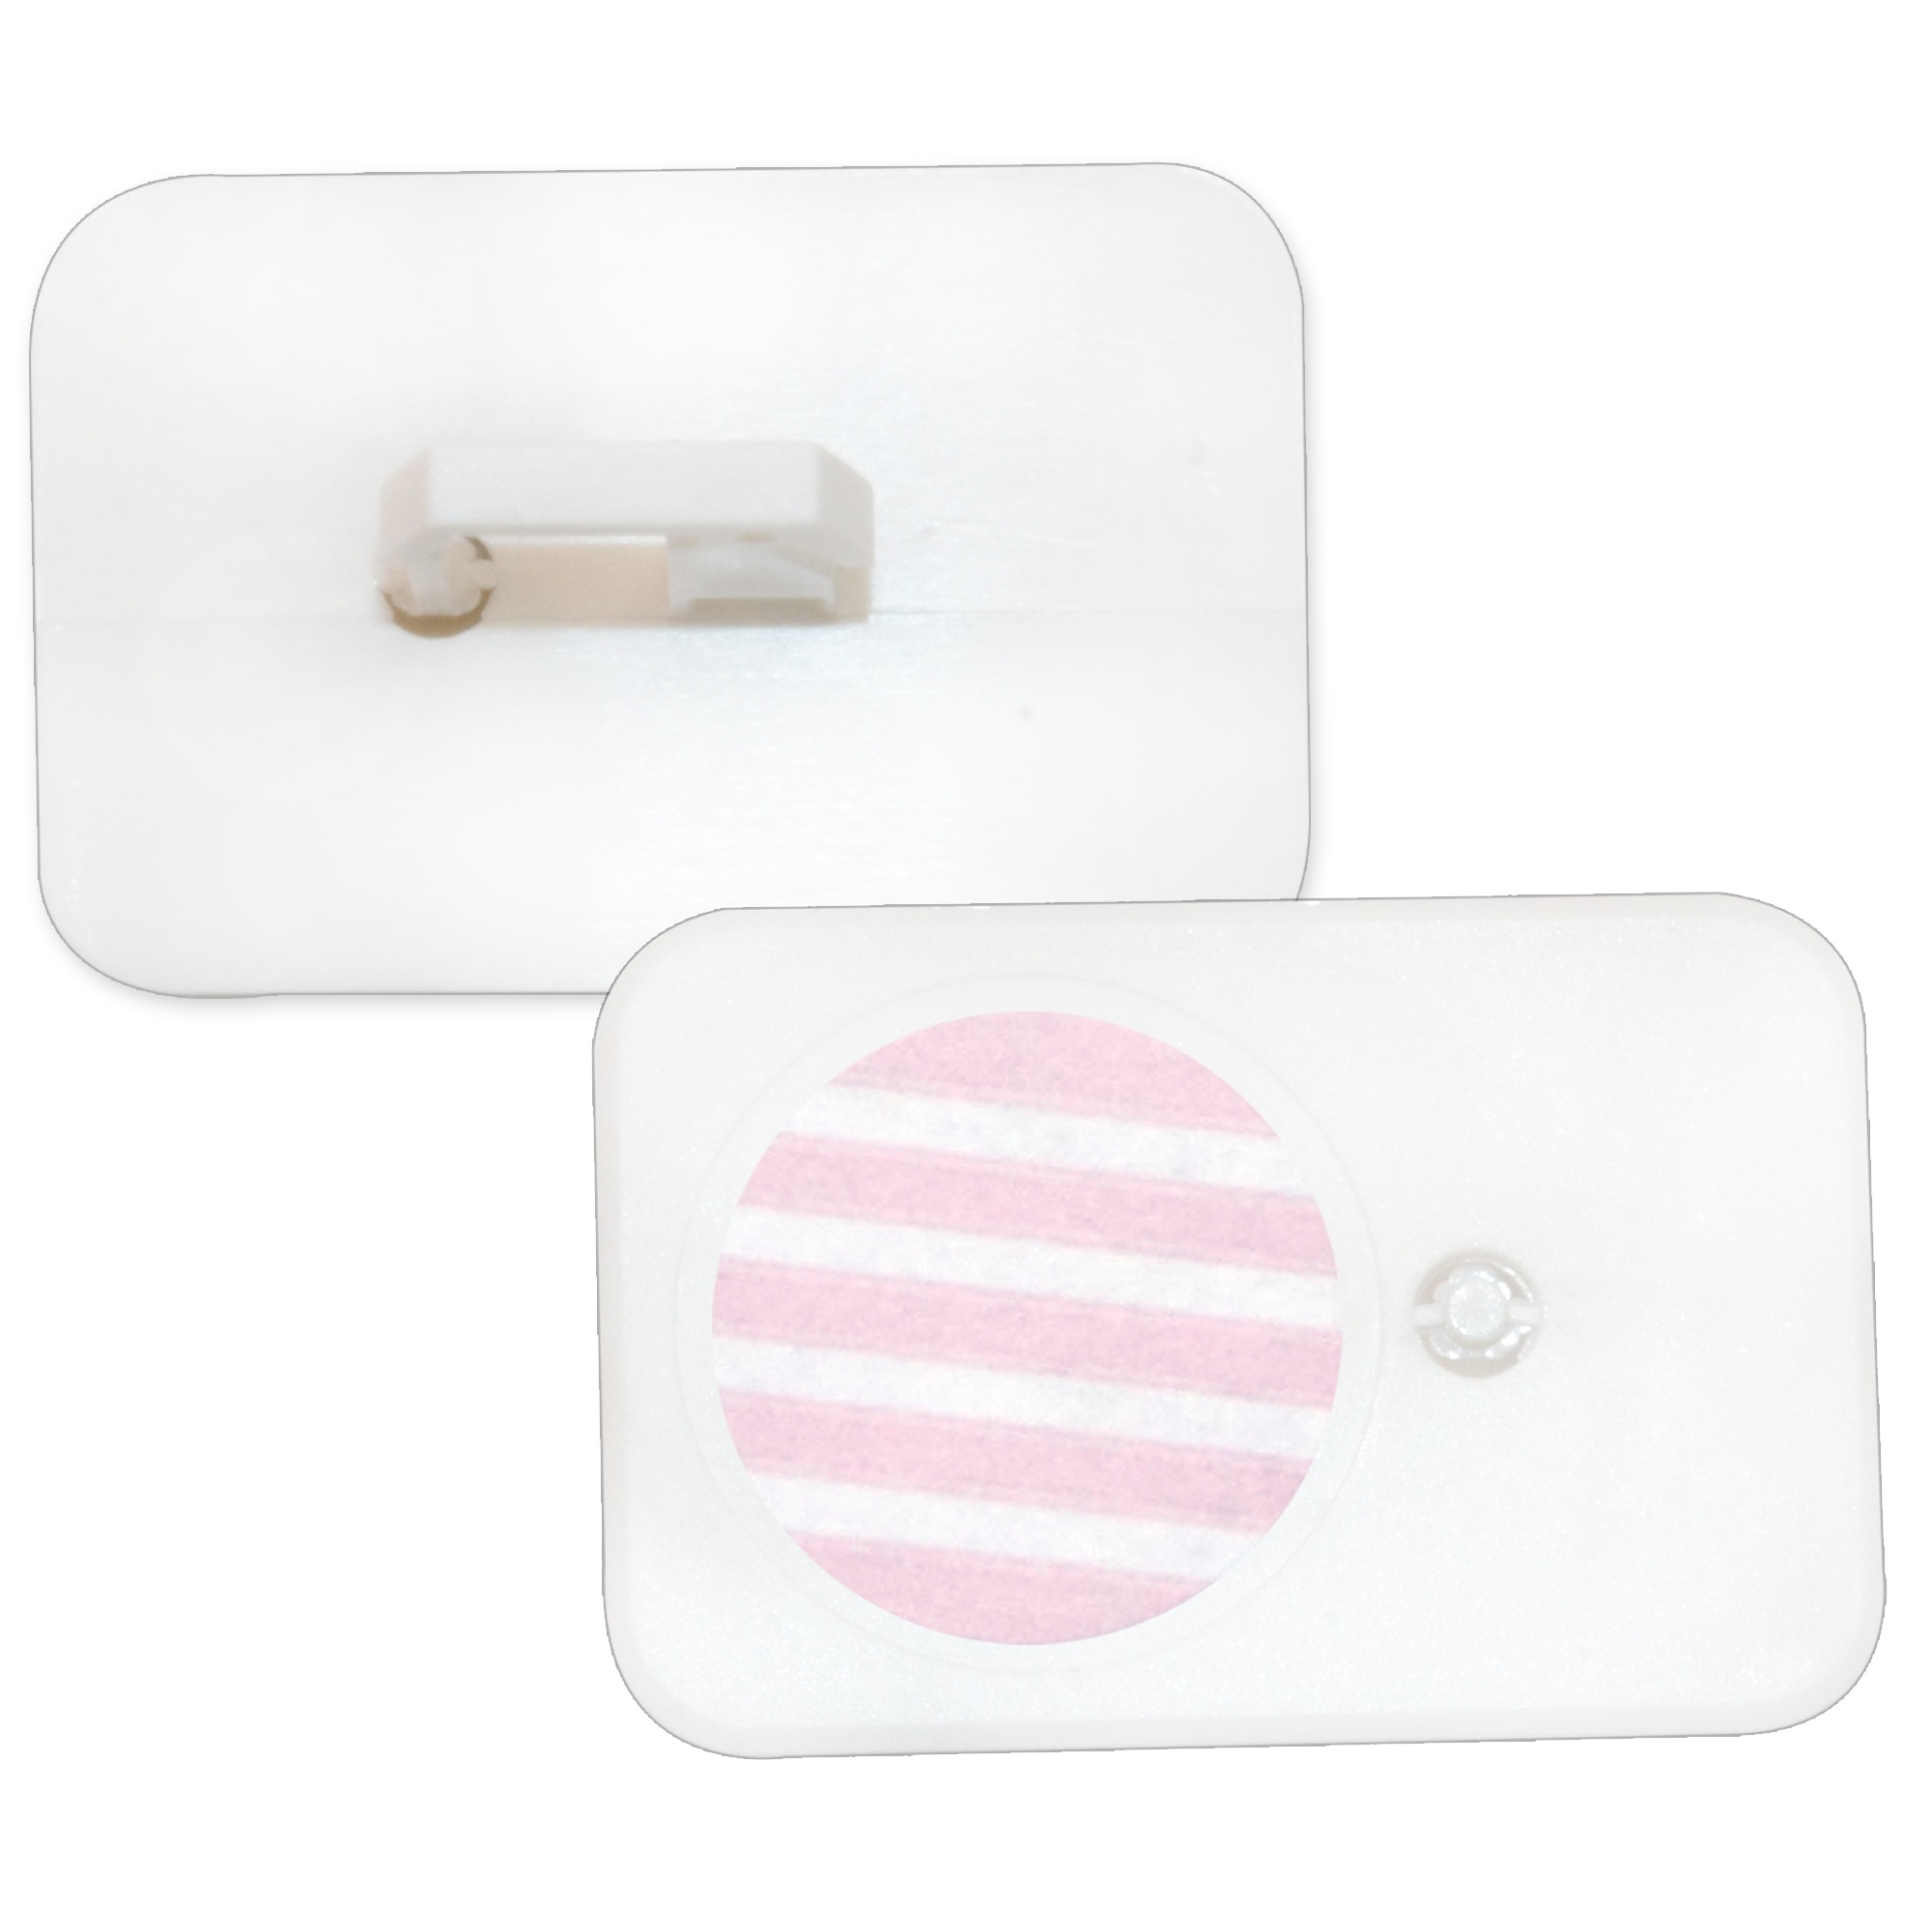 Plastic Seal Image